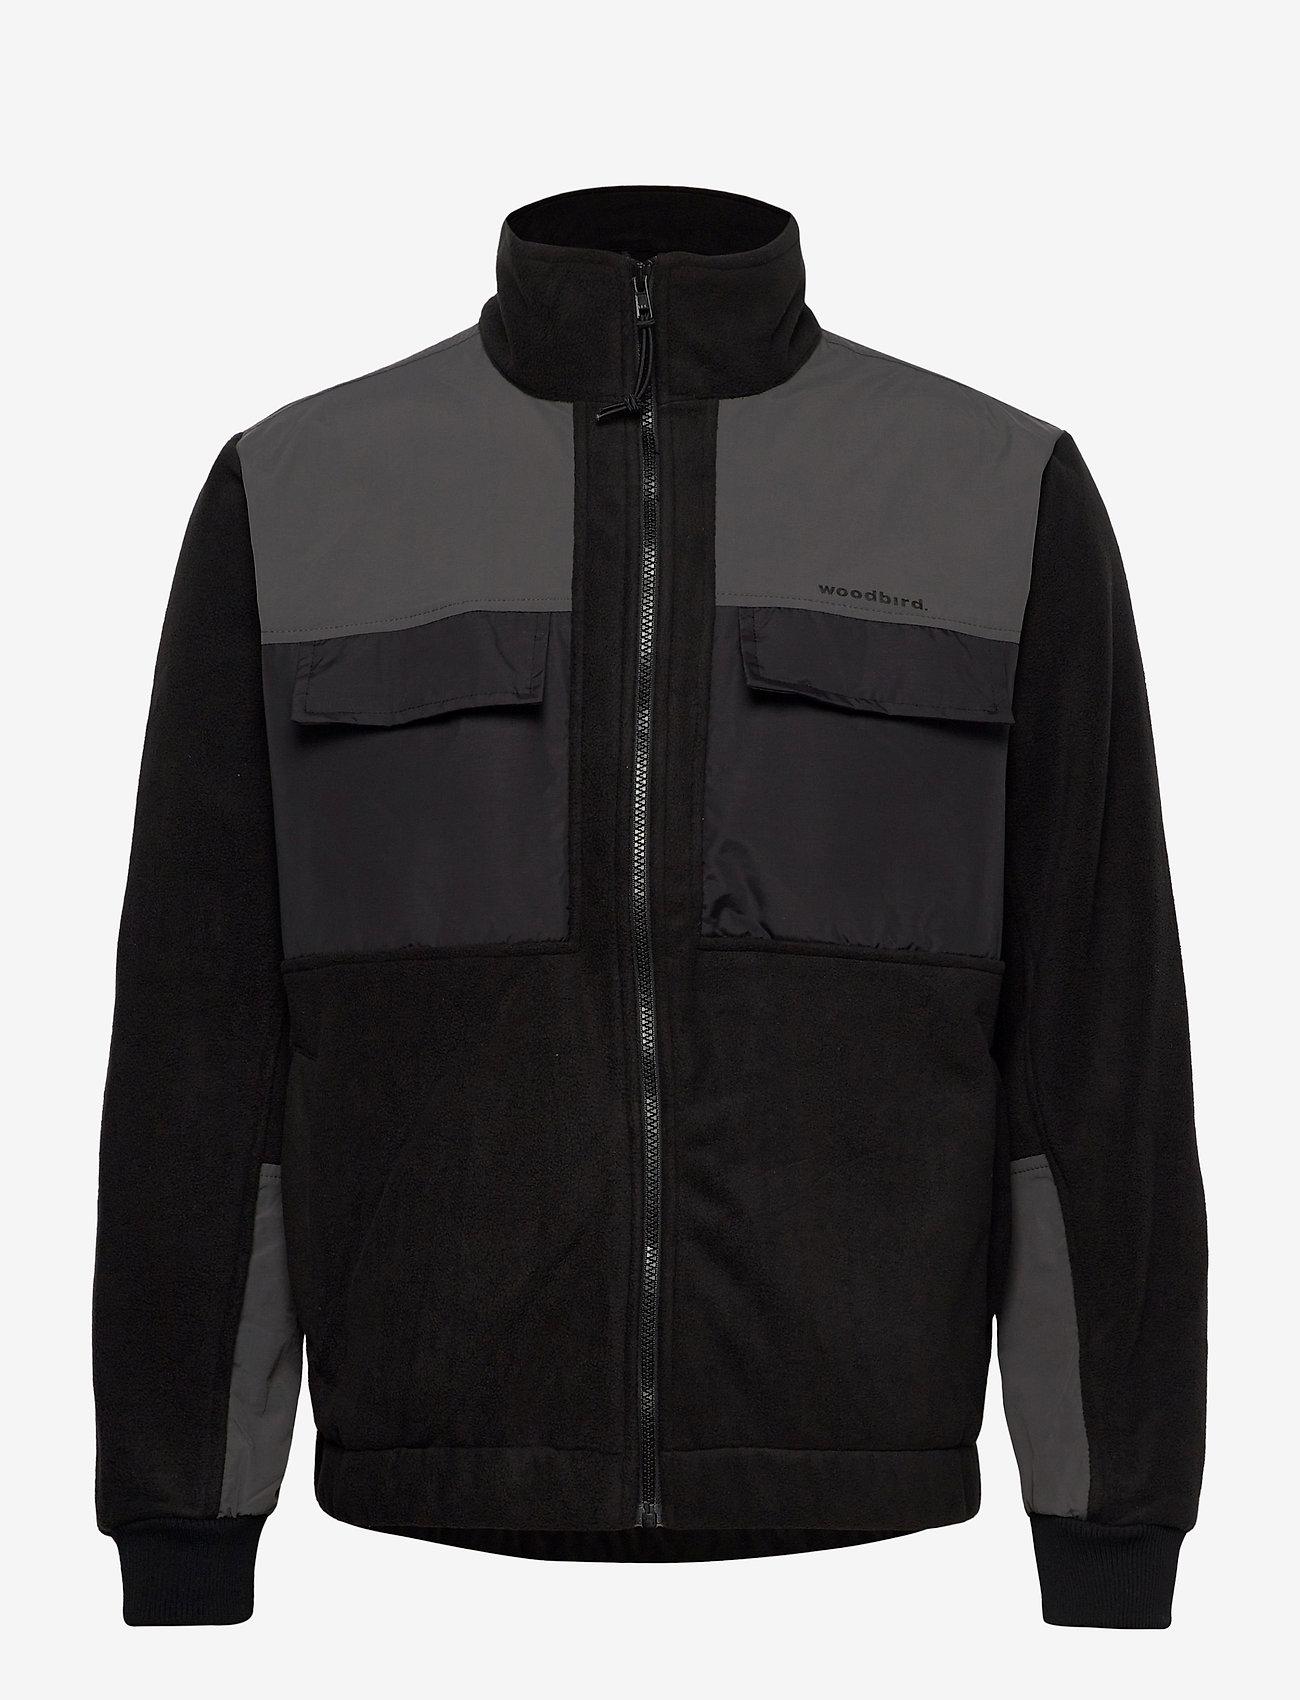 Woodbird - Strukt Zip Fleece - podstawowe bluzy - black - 1